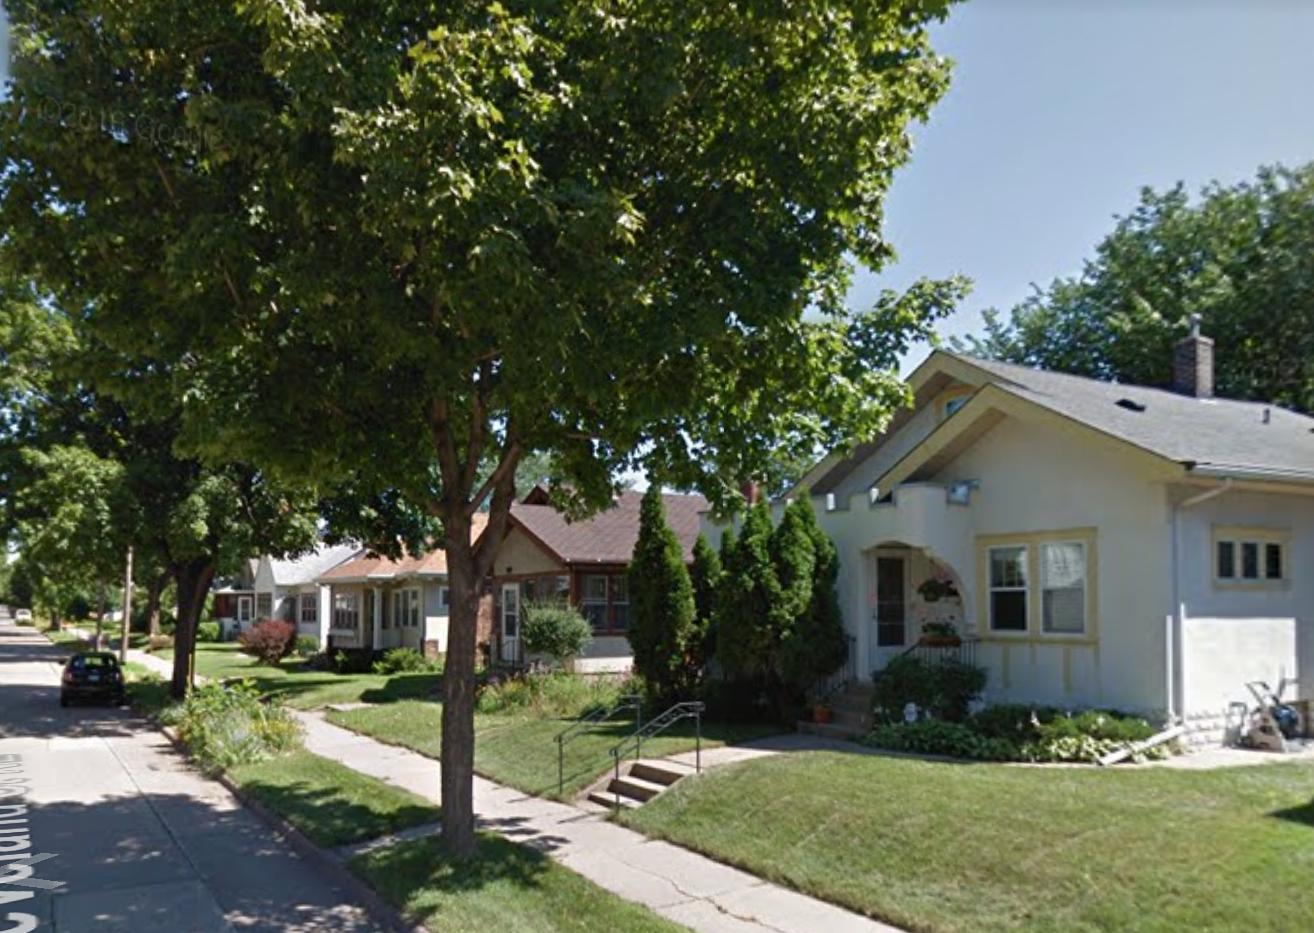 Google street view of my future street in Northeast, Minneapolis